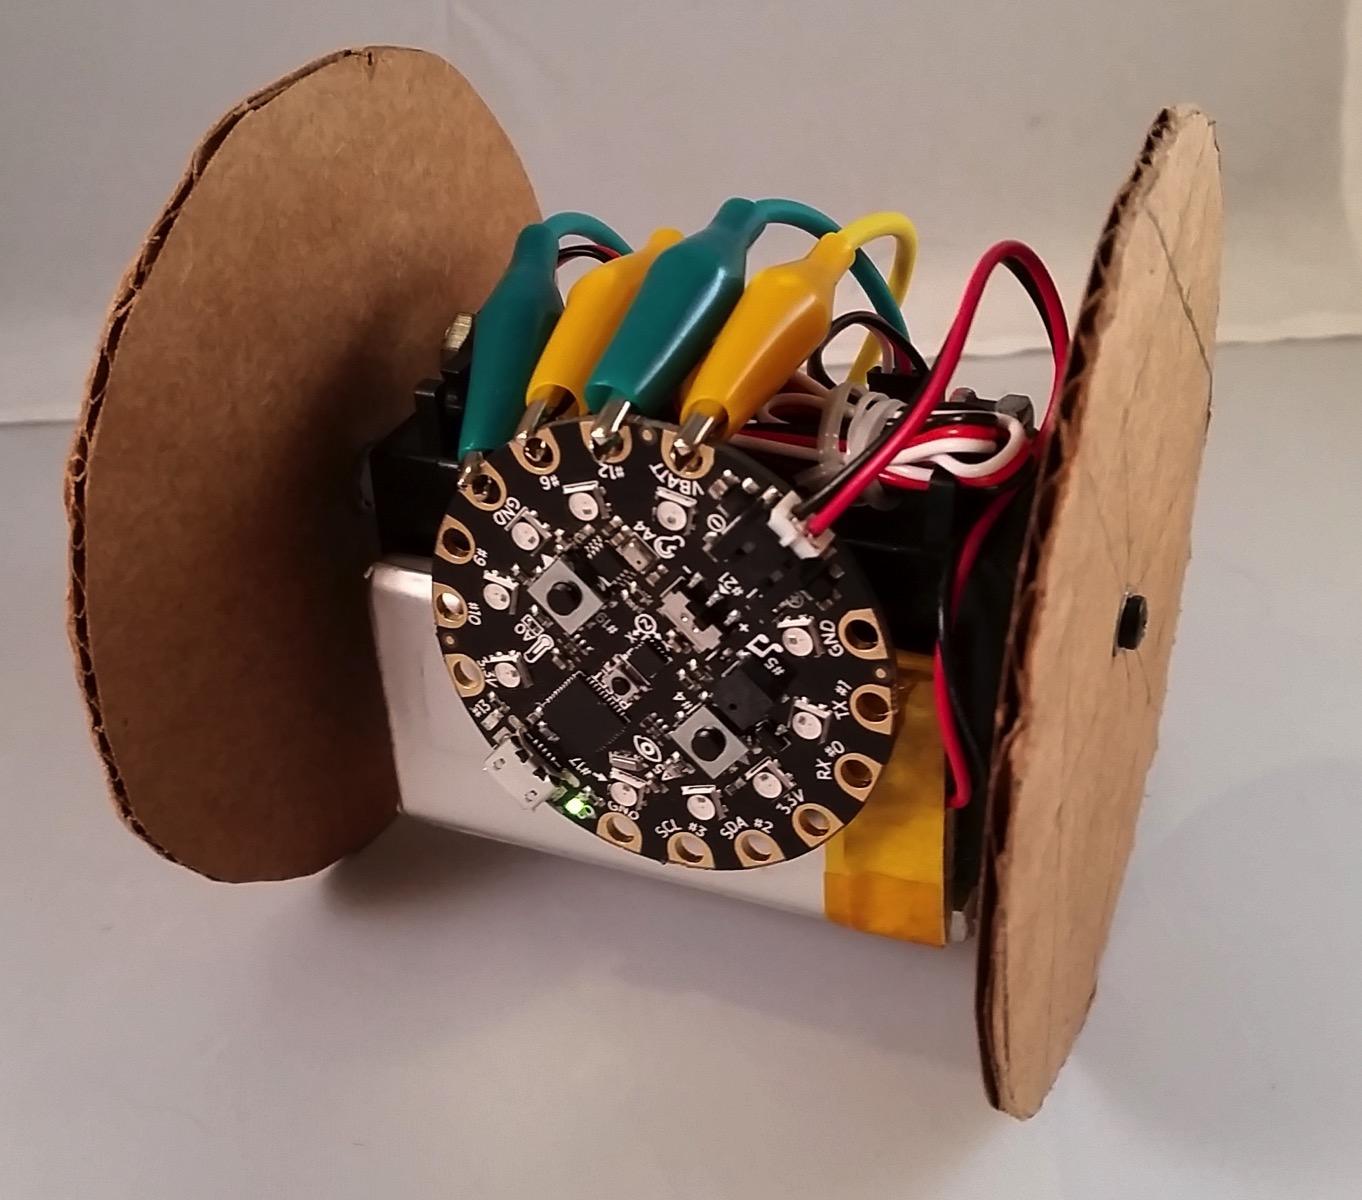 circuit_playground_robot